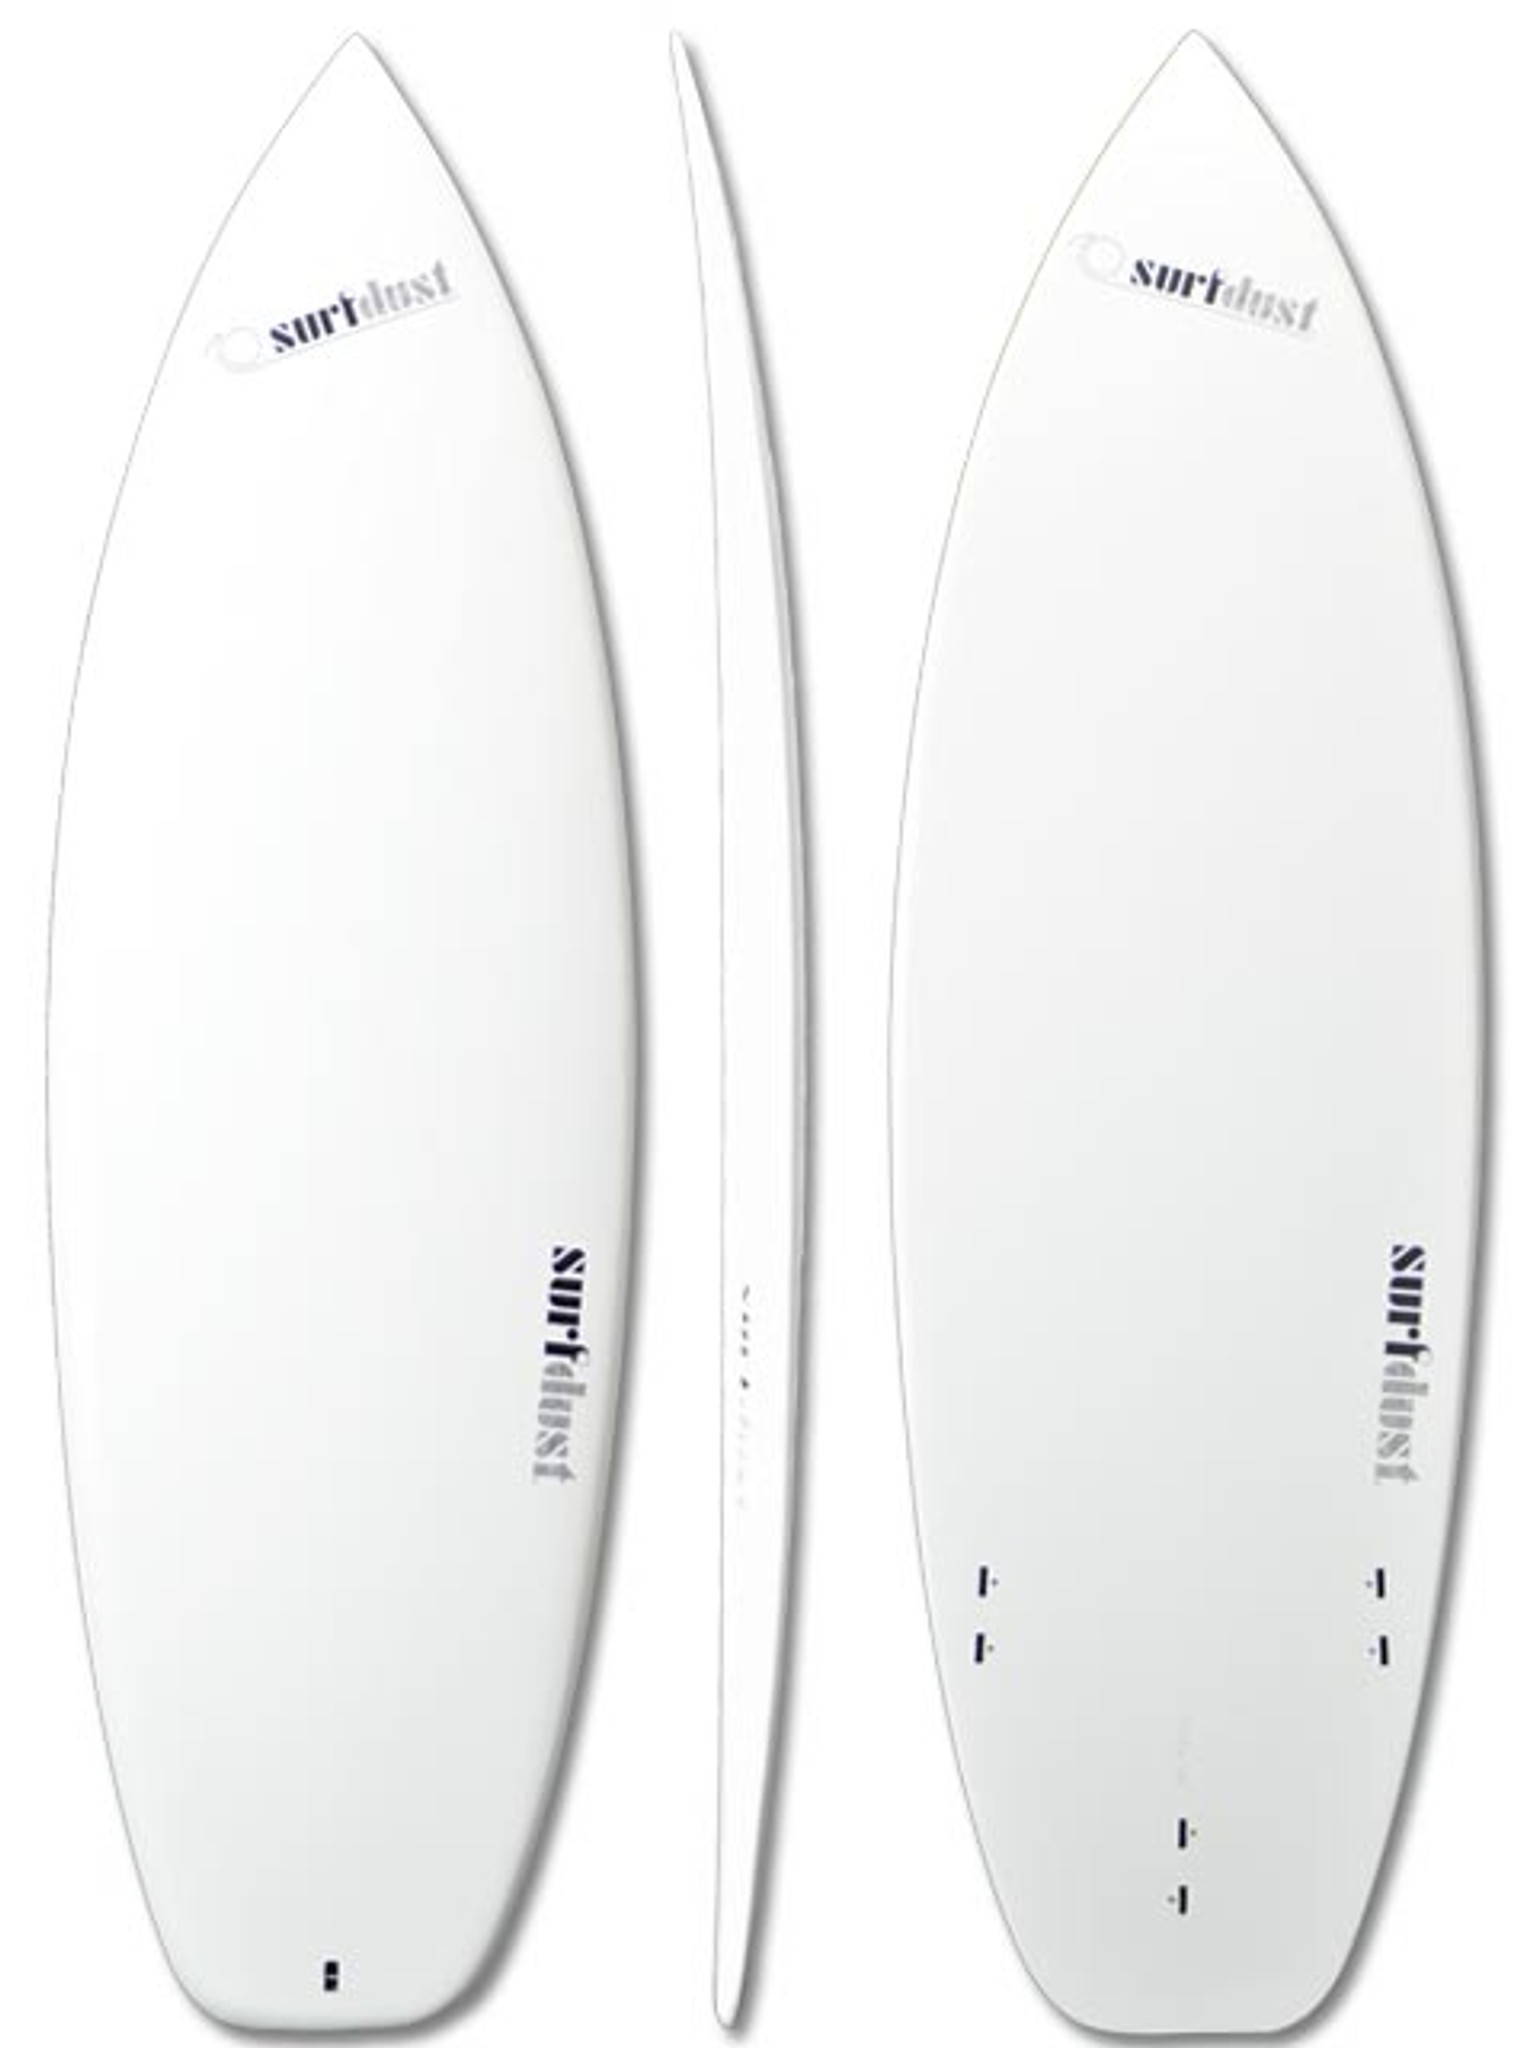 Tri Fins Short Boards SURFDUST Surfboards 5.4ft